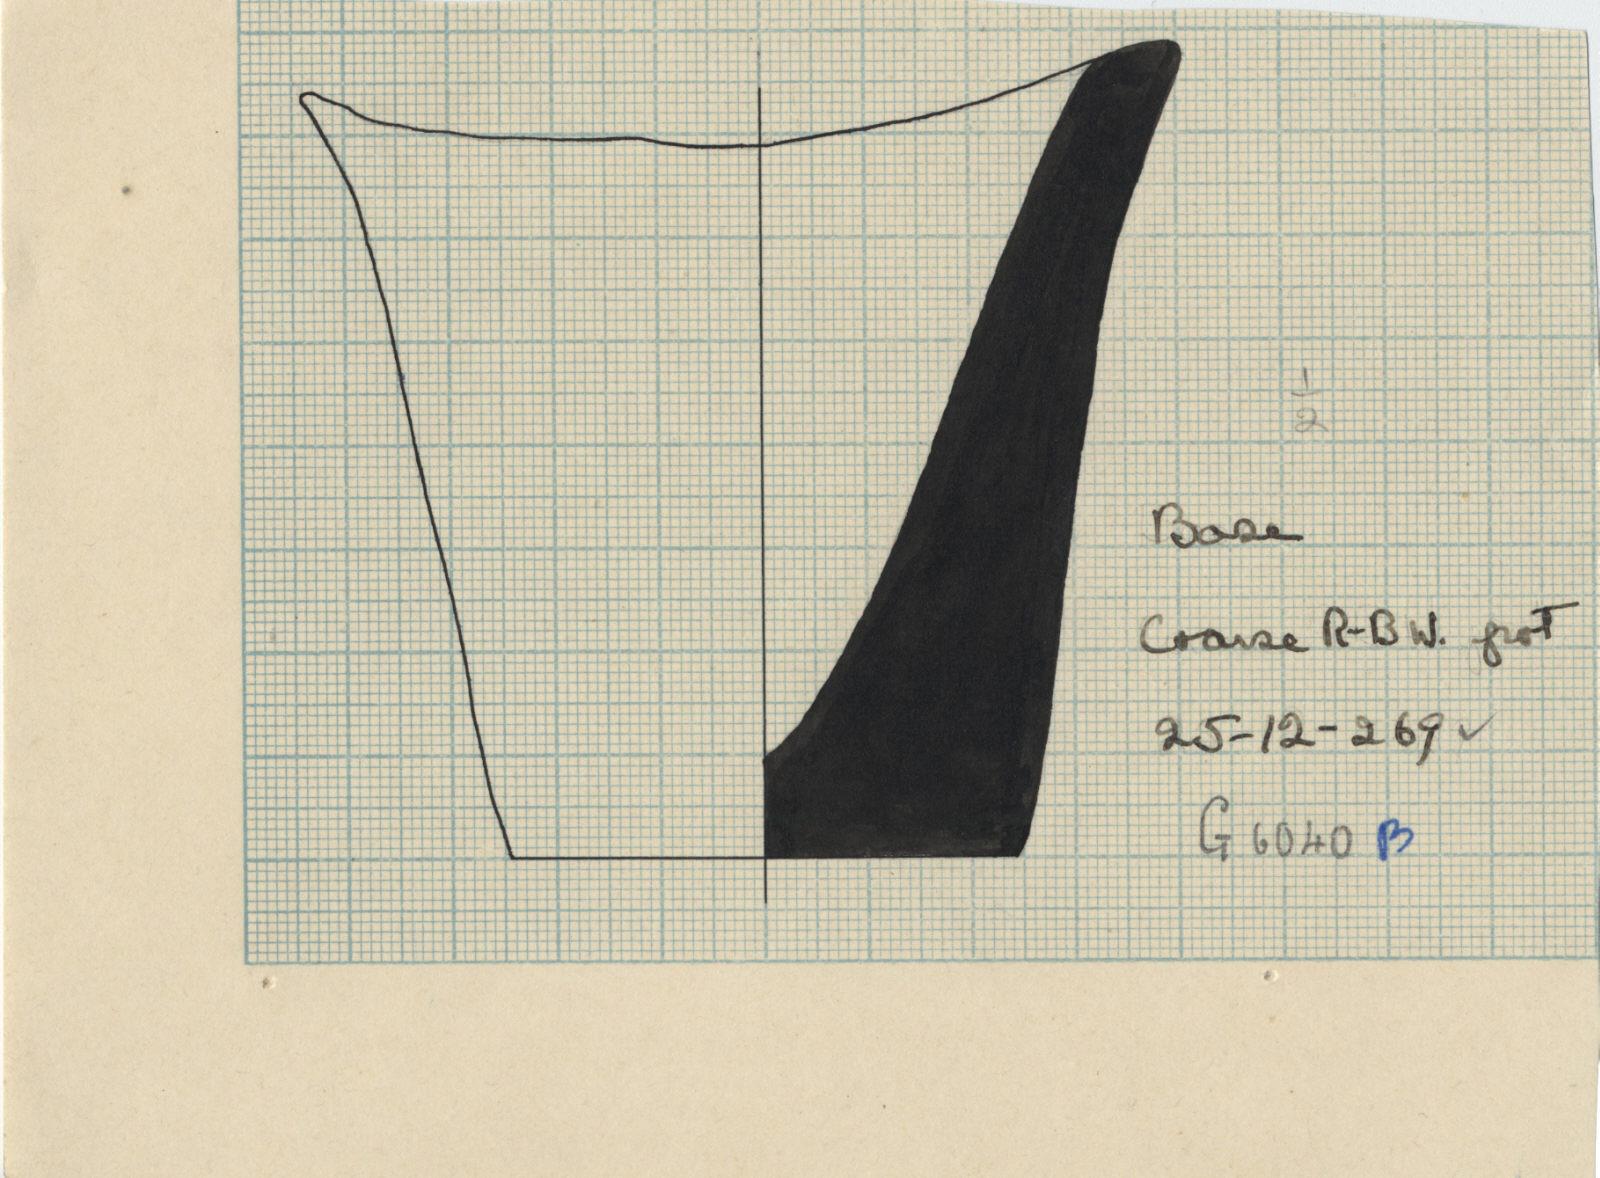 Drawings: G 6040, Shaft B: pottery, jar fragment